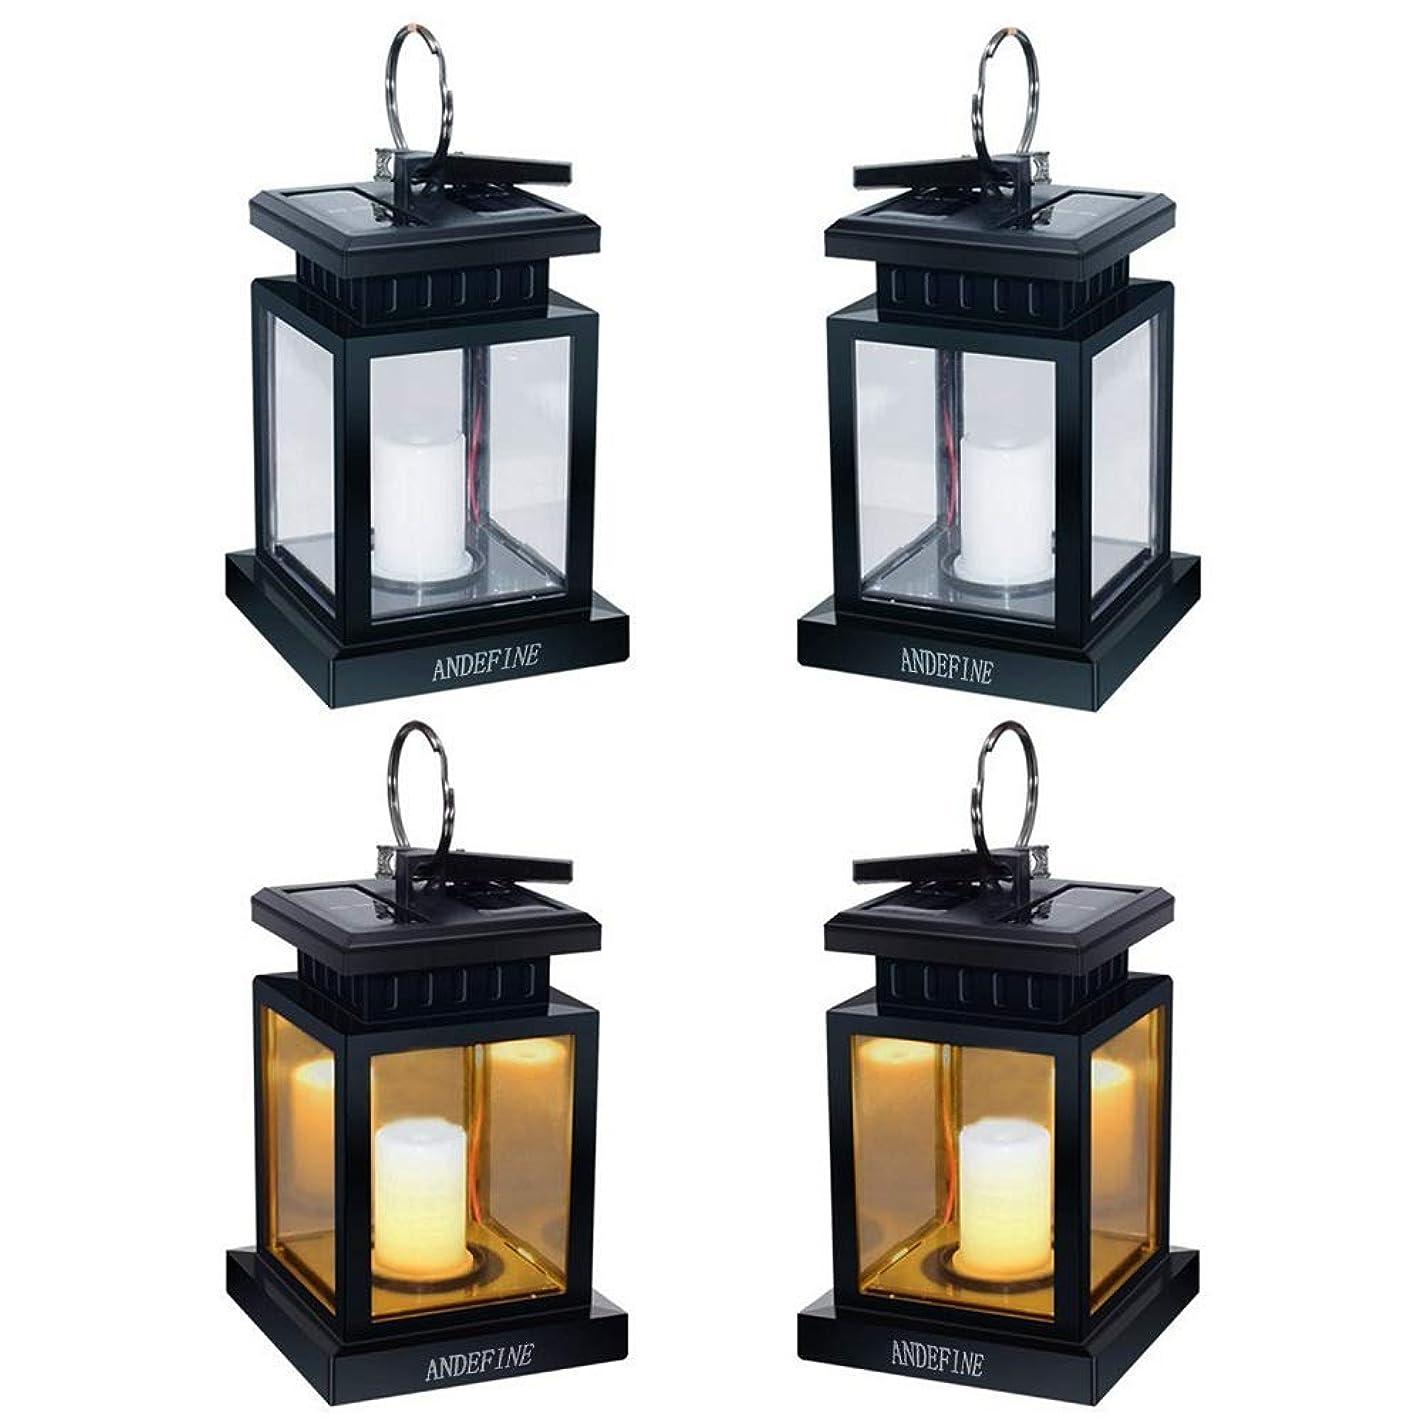 ANDEFINE Hanging Solar Lanterns, Hanging Solar Lights Outdoor Umbrella Lights Waterproof Candle Lamps Hang on Trees Patio Landscape Yard Solar Garden Lights (Yellow Light, 4 Pack)